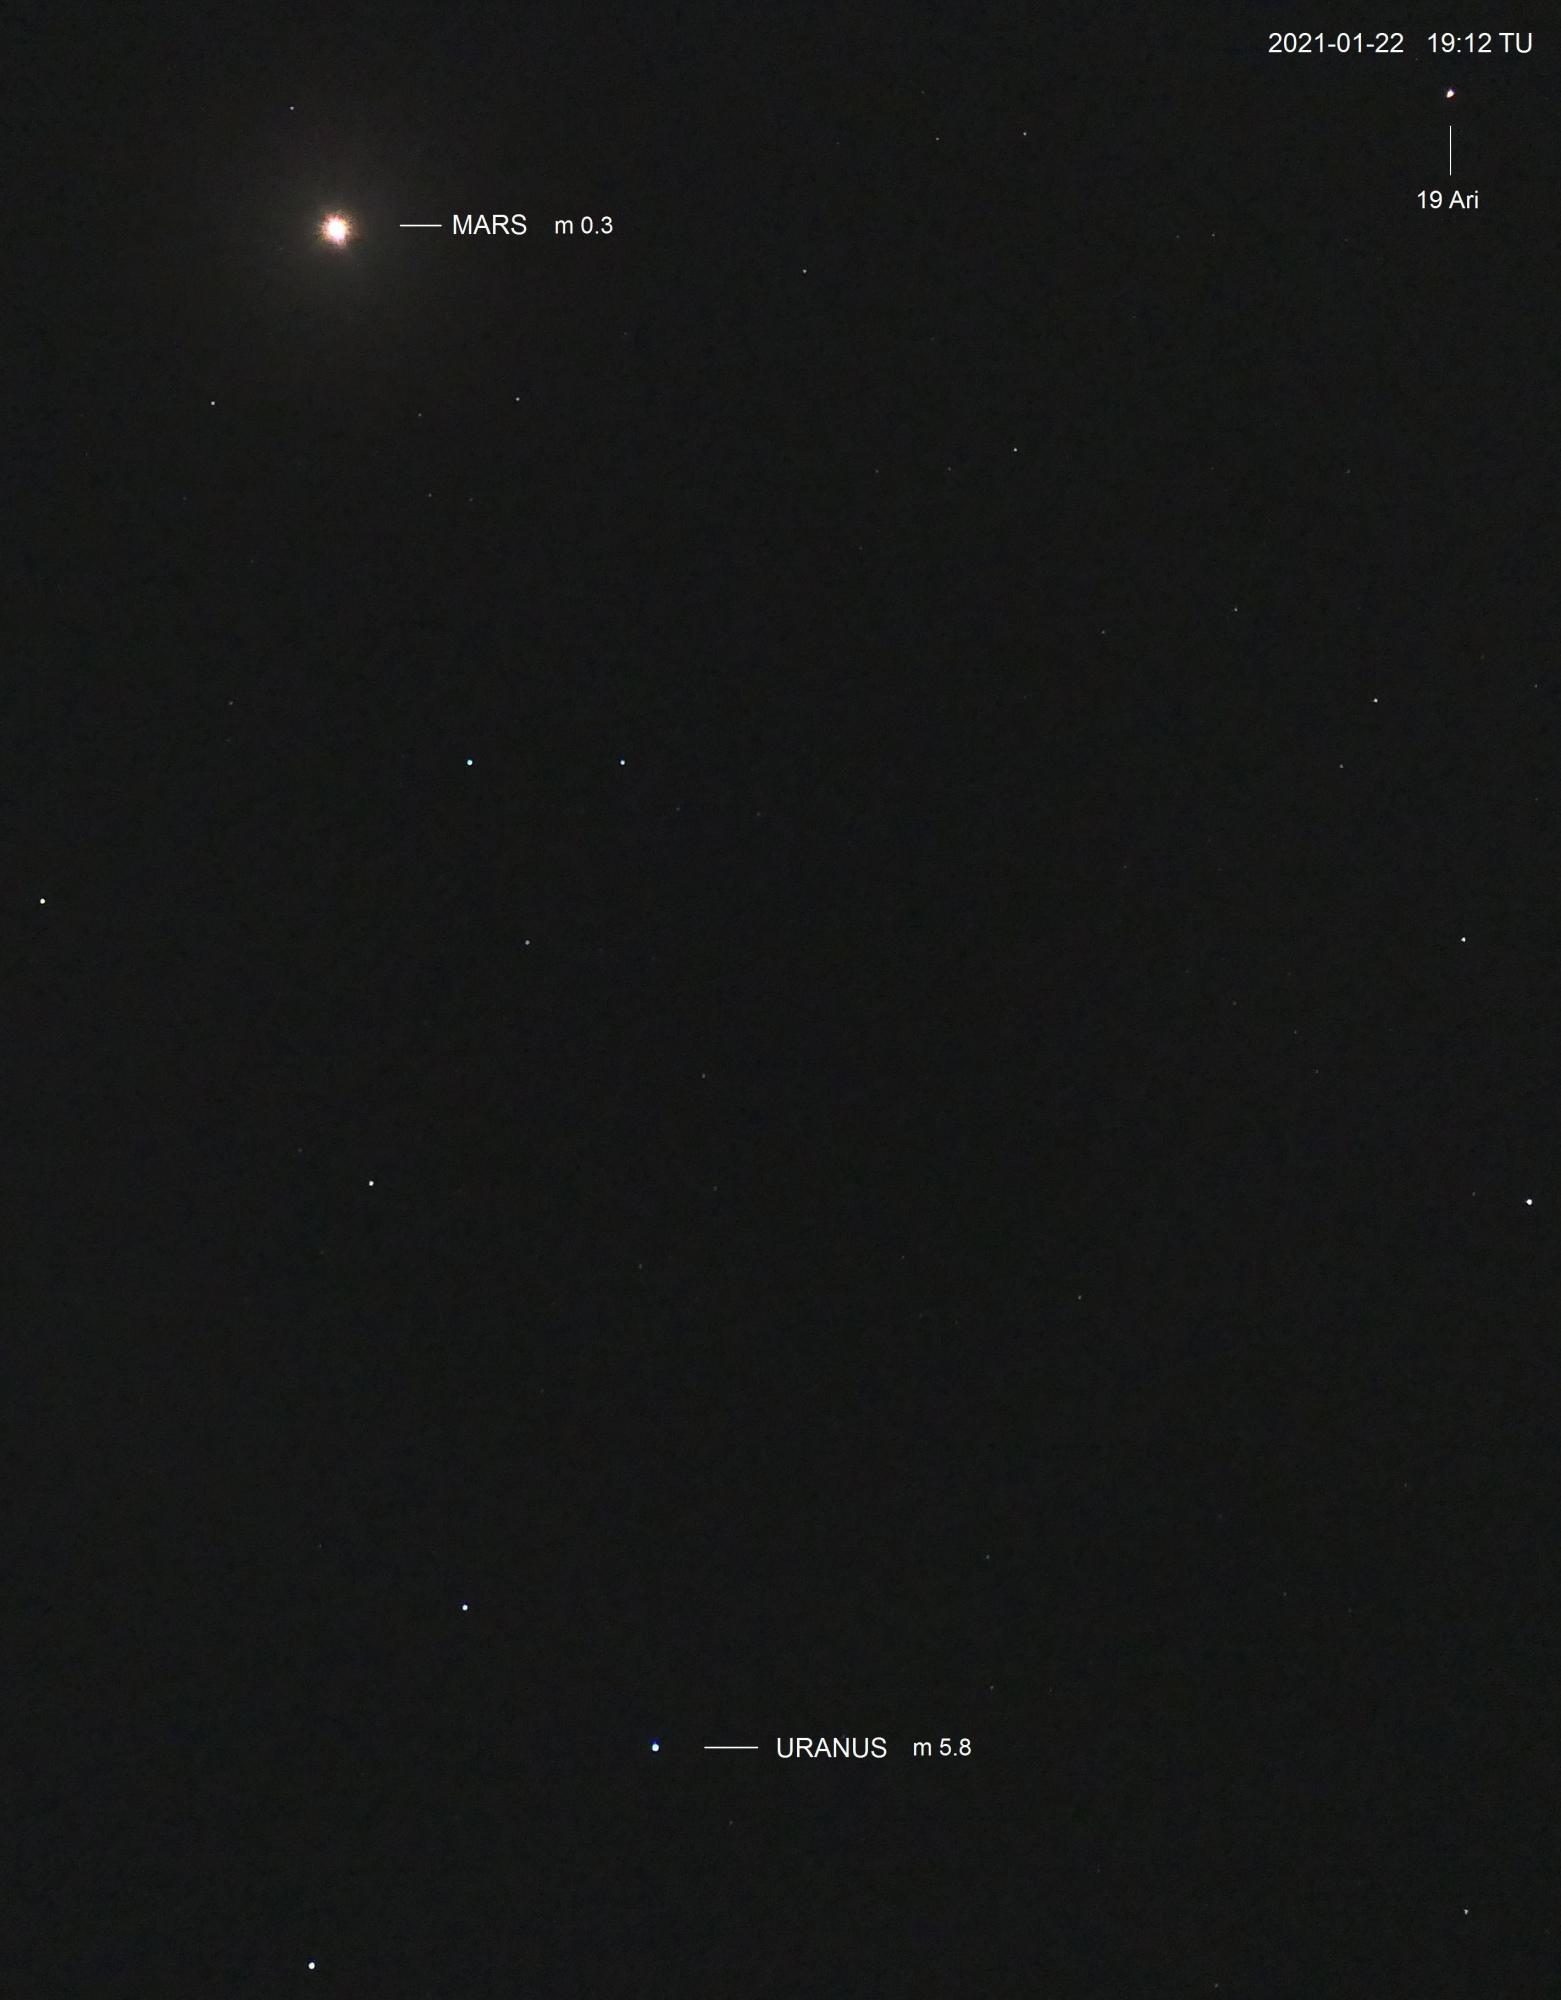 600c6443daf71_P1100642_Mars-Uranus_8.49-3.58_Blier_ASF.thumb.JPG.5cf91b0b438662923c70fd0b5bdf8ffc.JPG